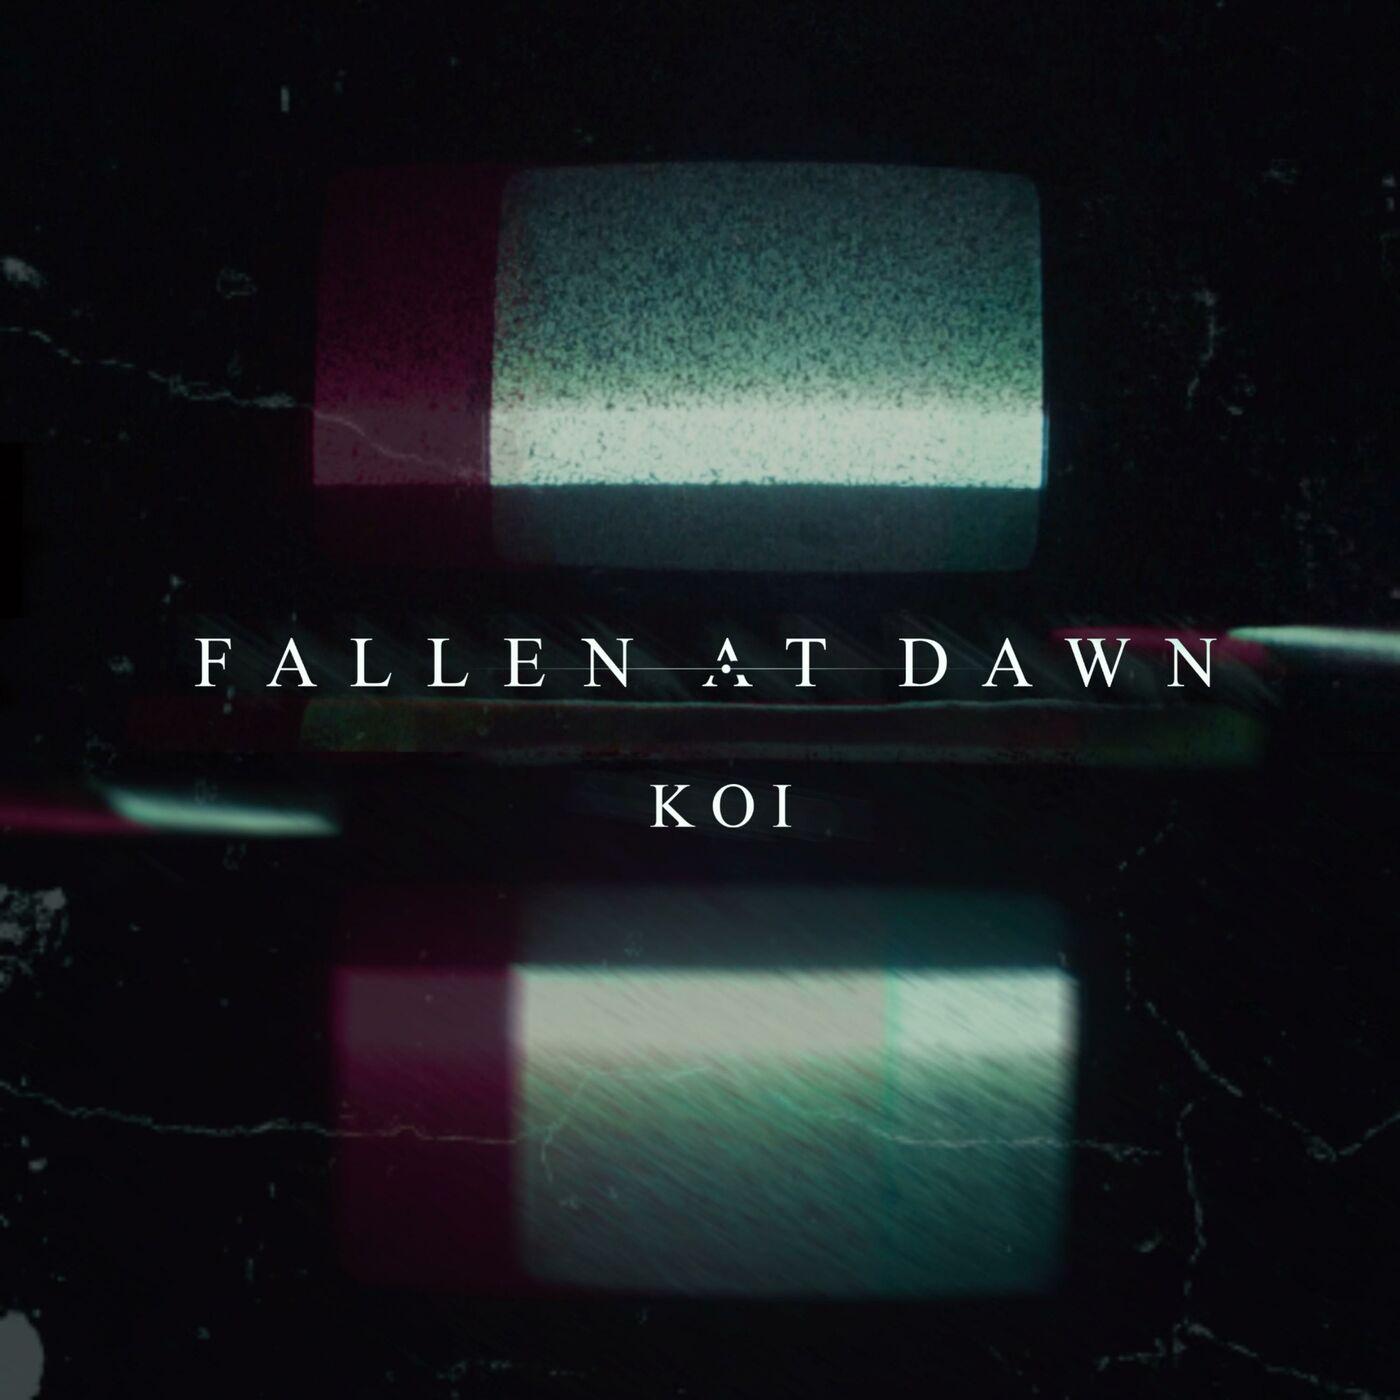 Fallen at Dawn - Koi [single] (2019)